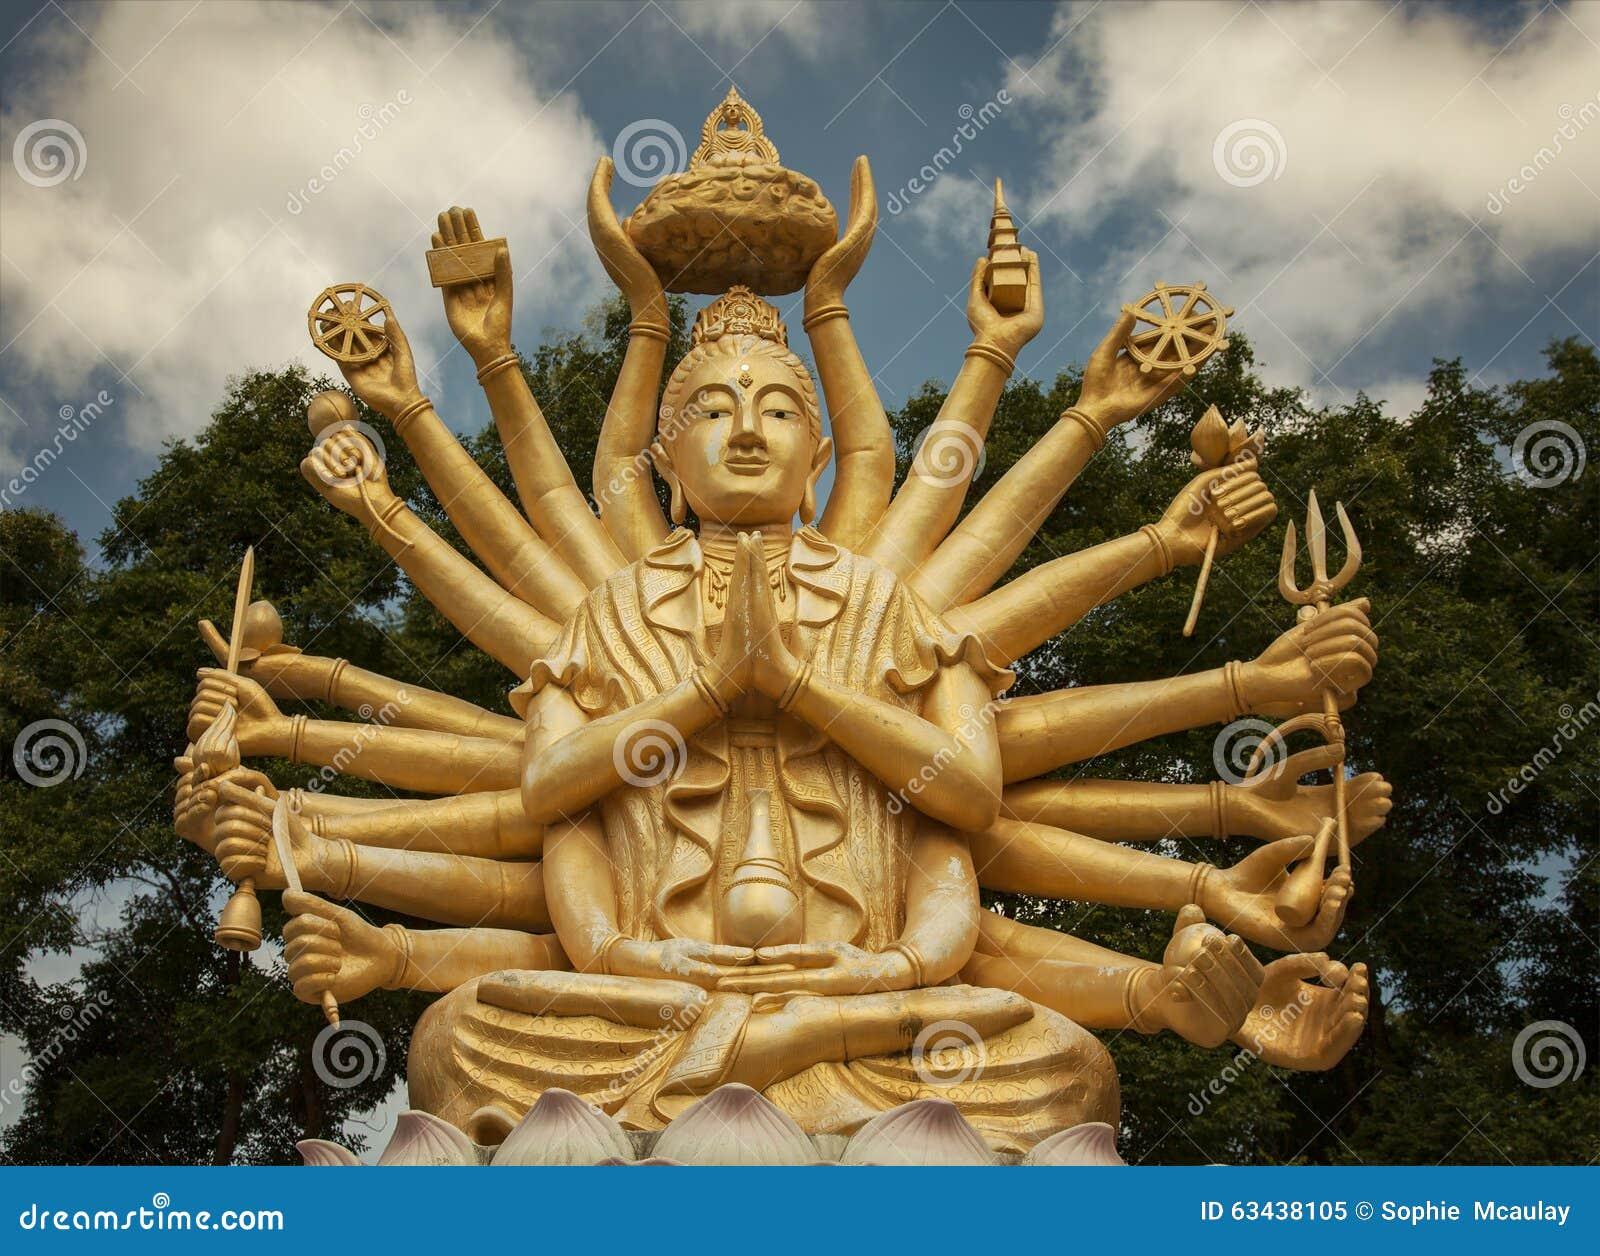 Multi Armed Buddha Stock Photo Image 63438105